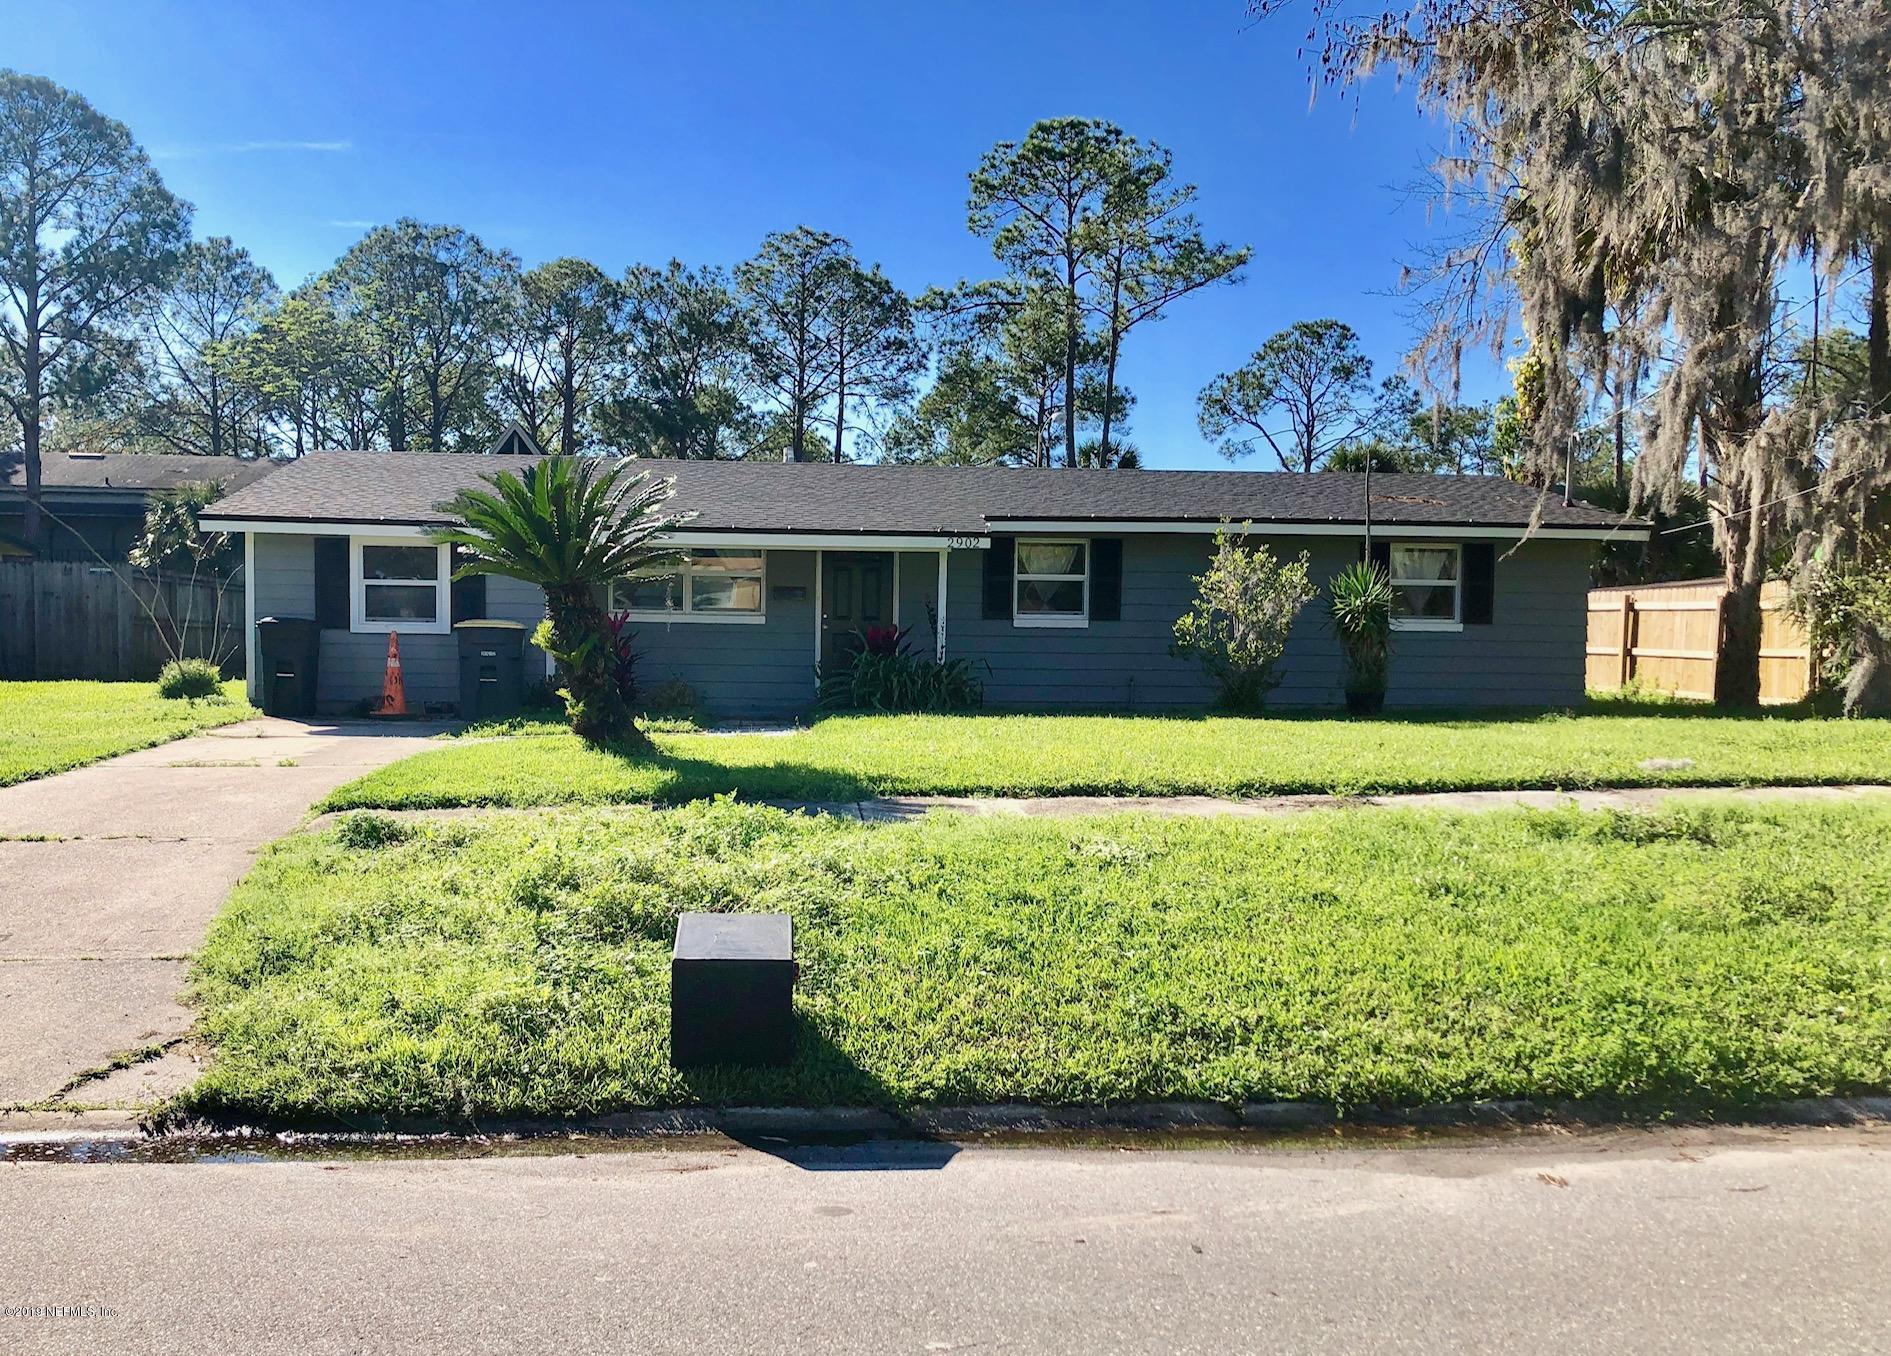 Photo of 2902 LORAN, JACKSONVILLE, FL 32216